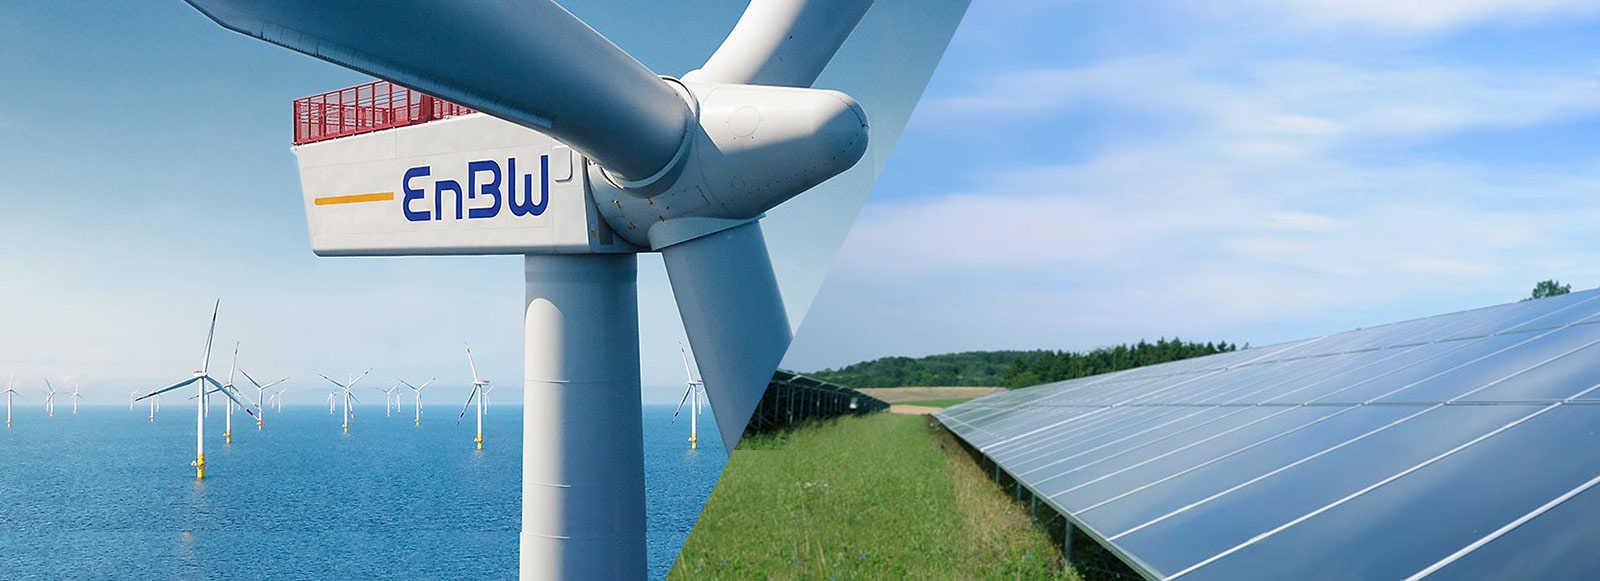 enbw-erneuerbare-energien-wind-solar